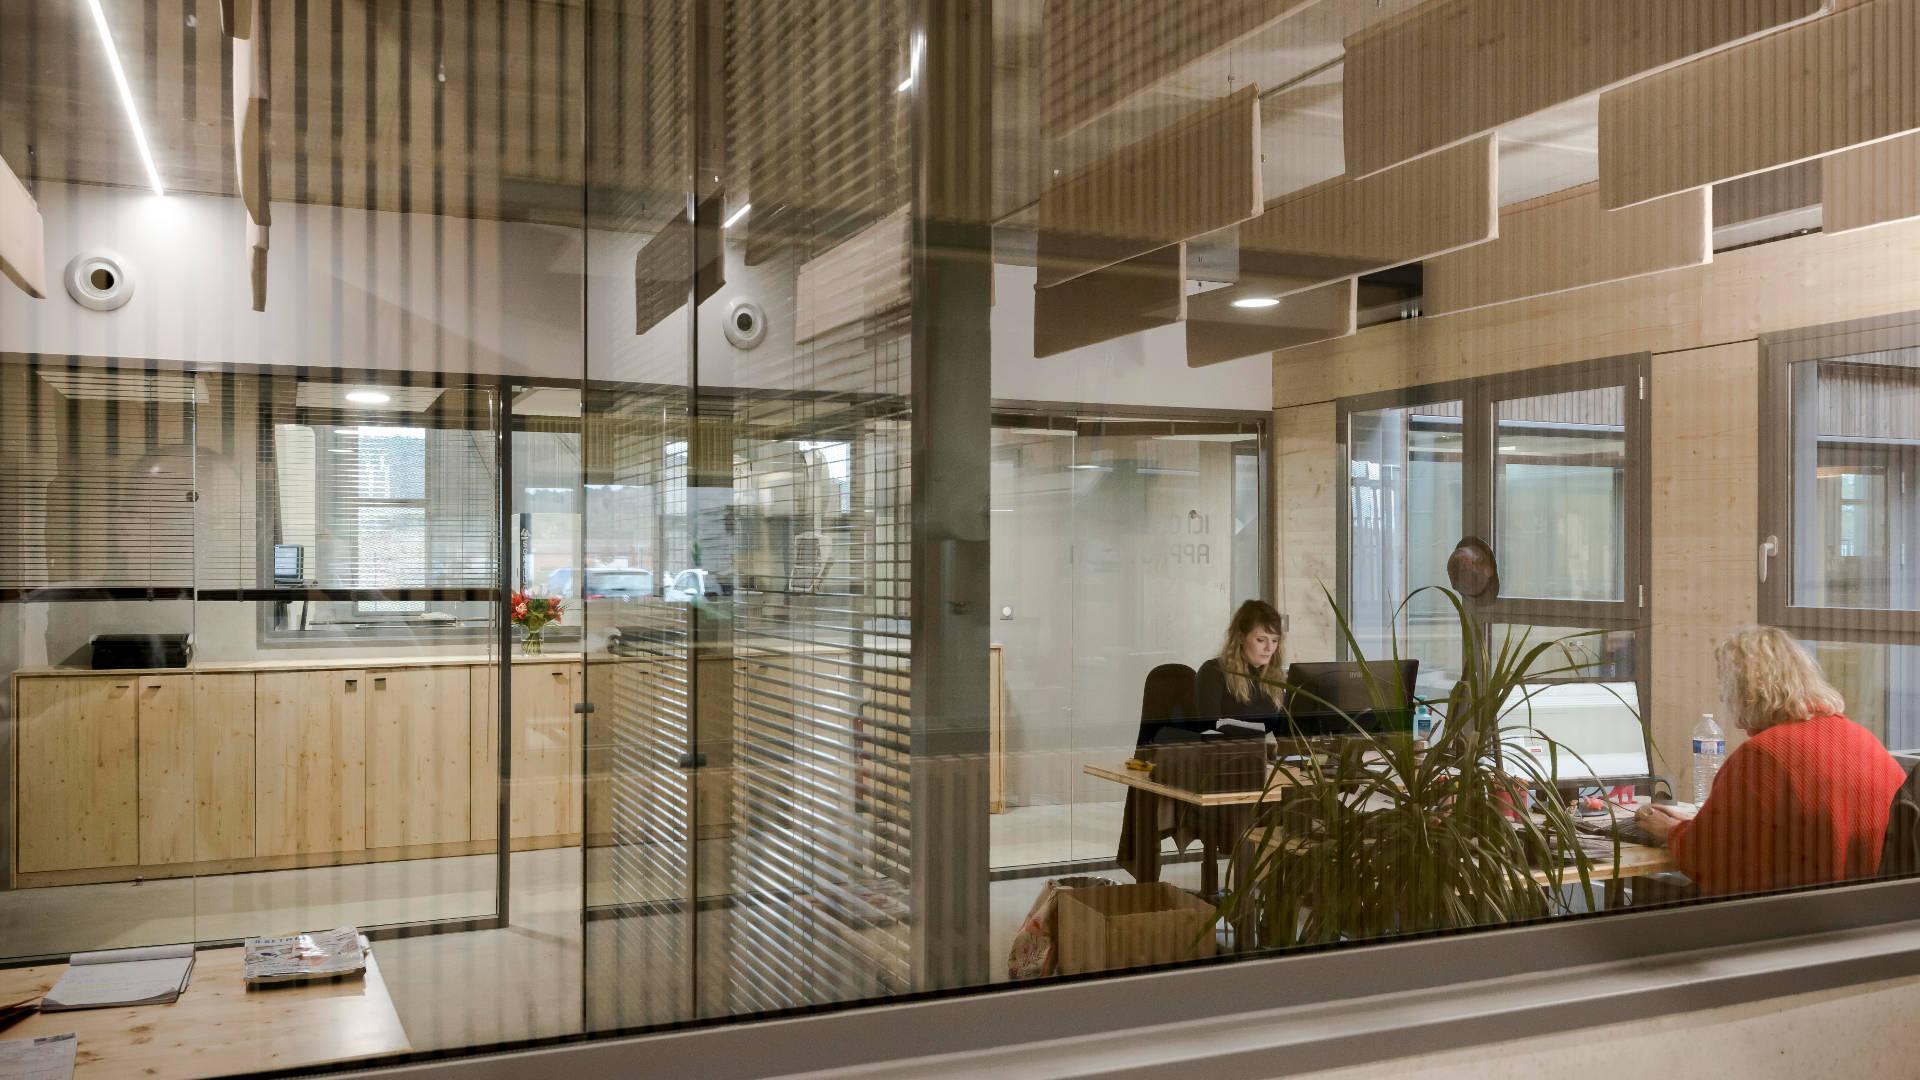 Seuil-architecture-aerem-usine-bureau-slid